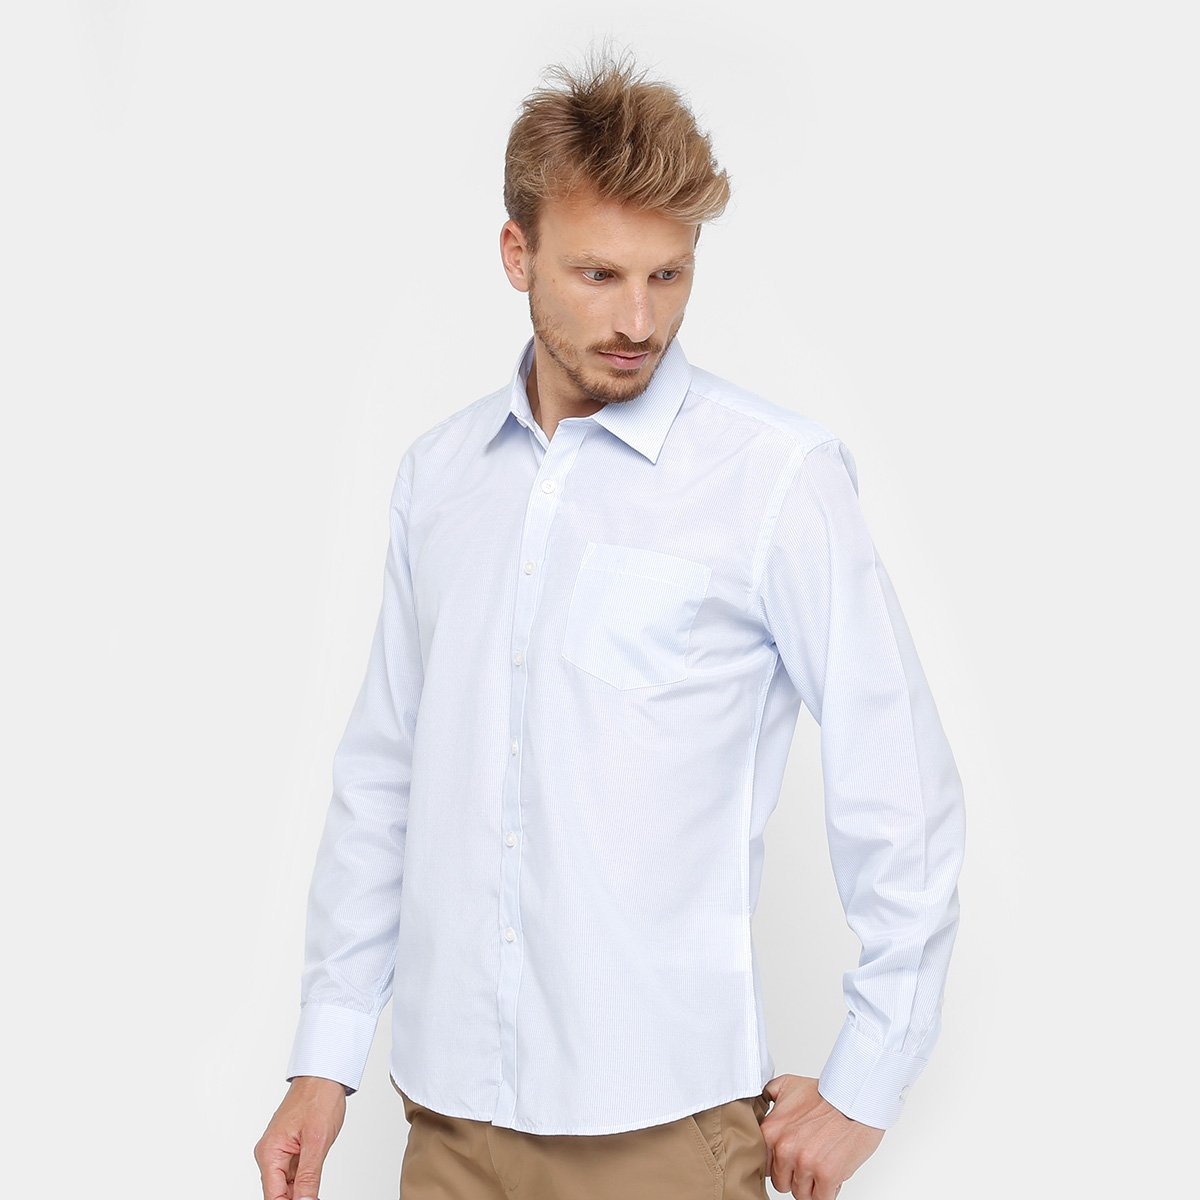 1fc656edd Camisa Social Blue Bay Manga Longa Bolso Masculina - Compre Agora ...